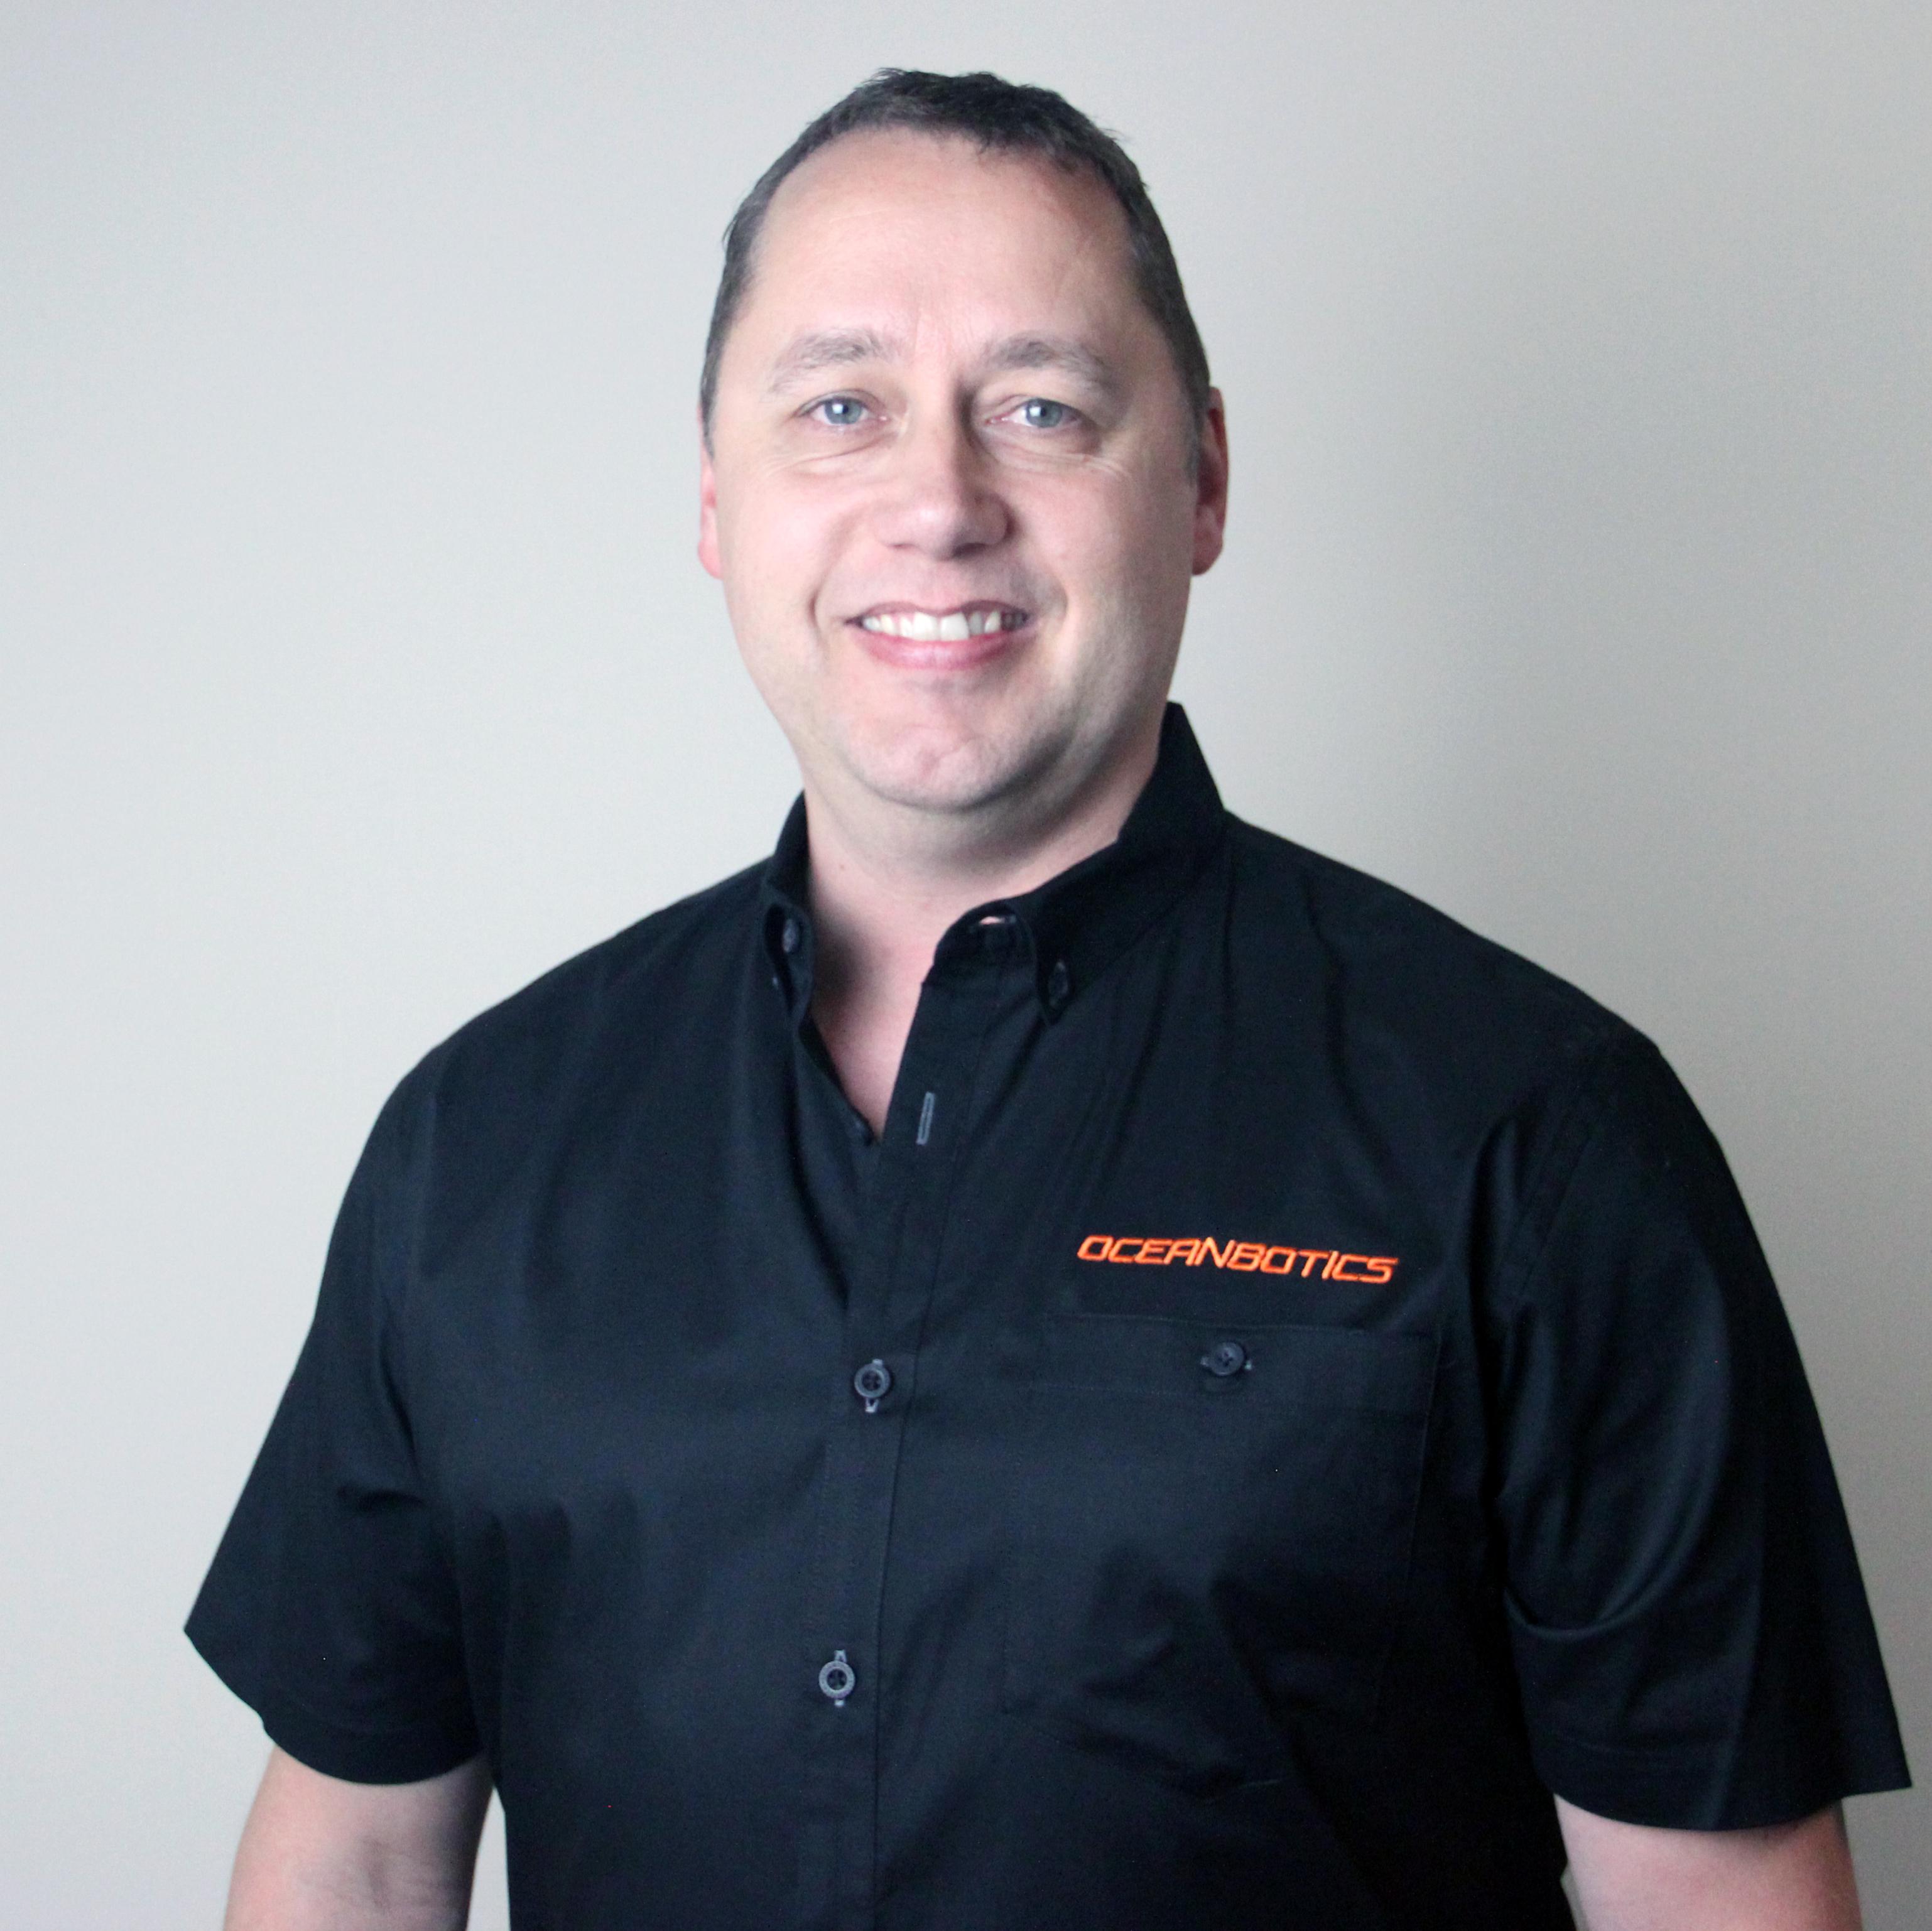 RJE Oceanbotics sales team headshot